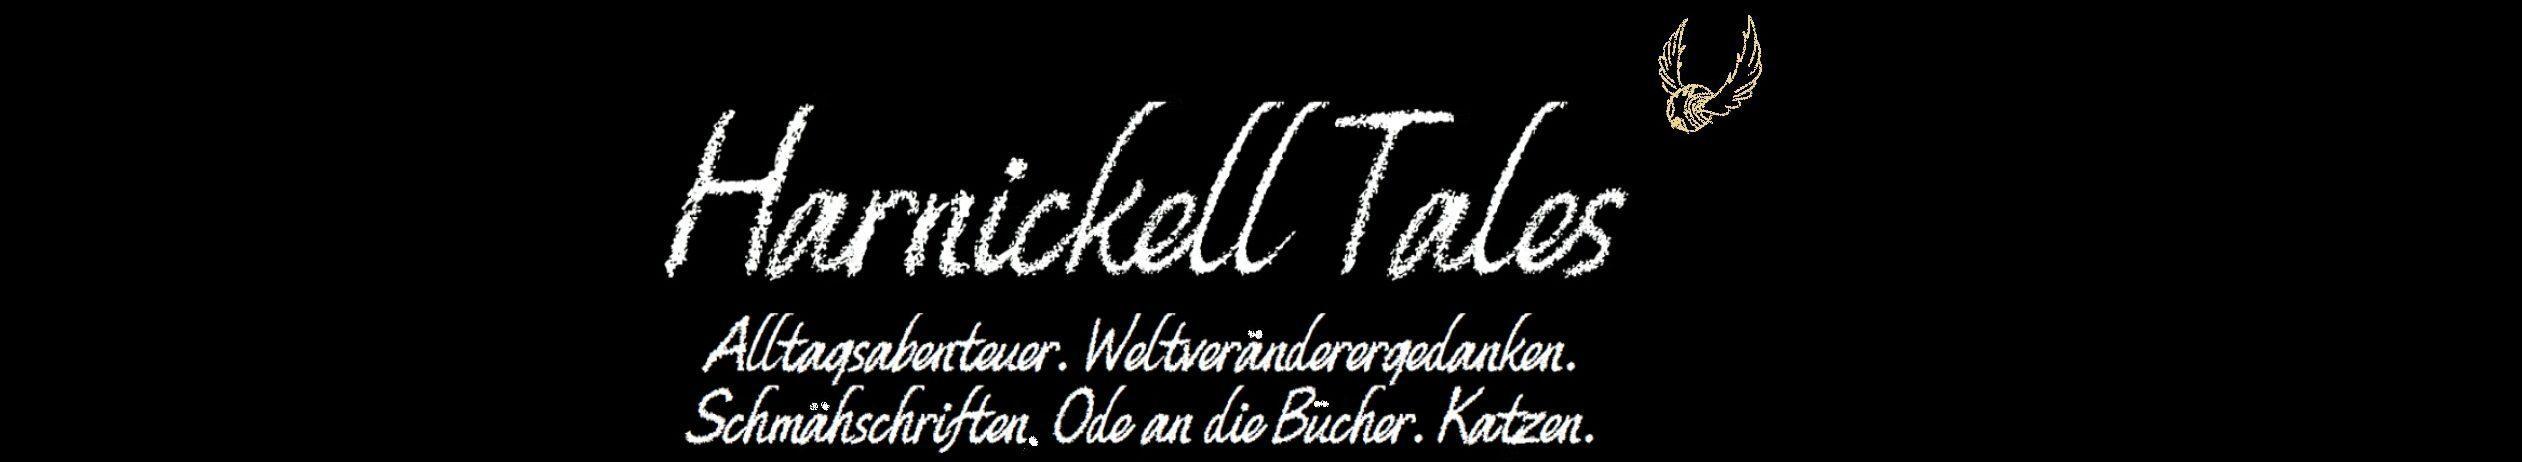 Harnickell Tales